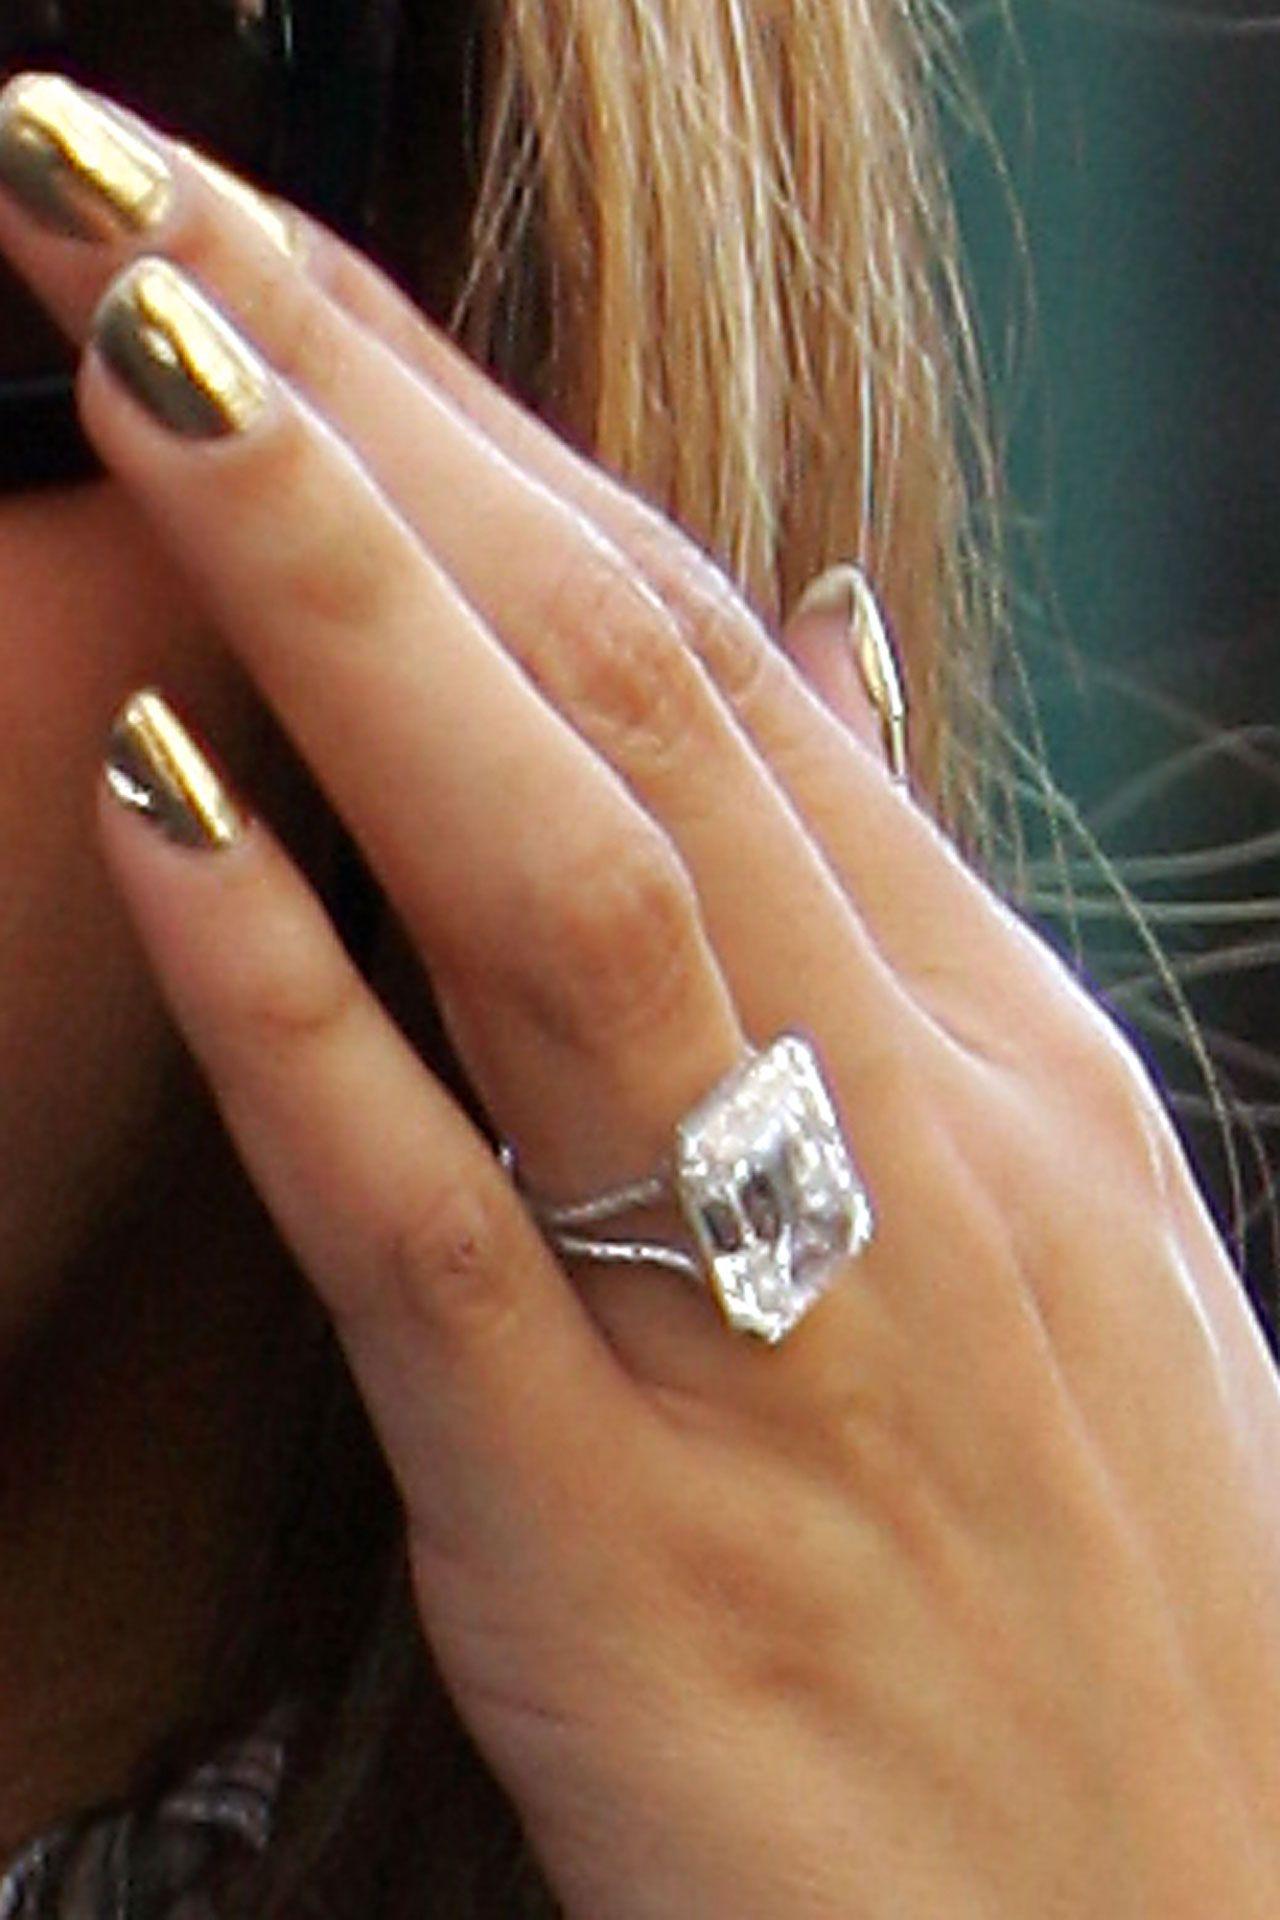 BEYONCé The ring by Lorraine Schwartz features a large emerald